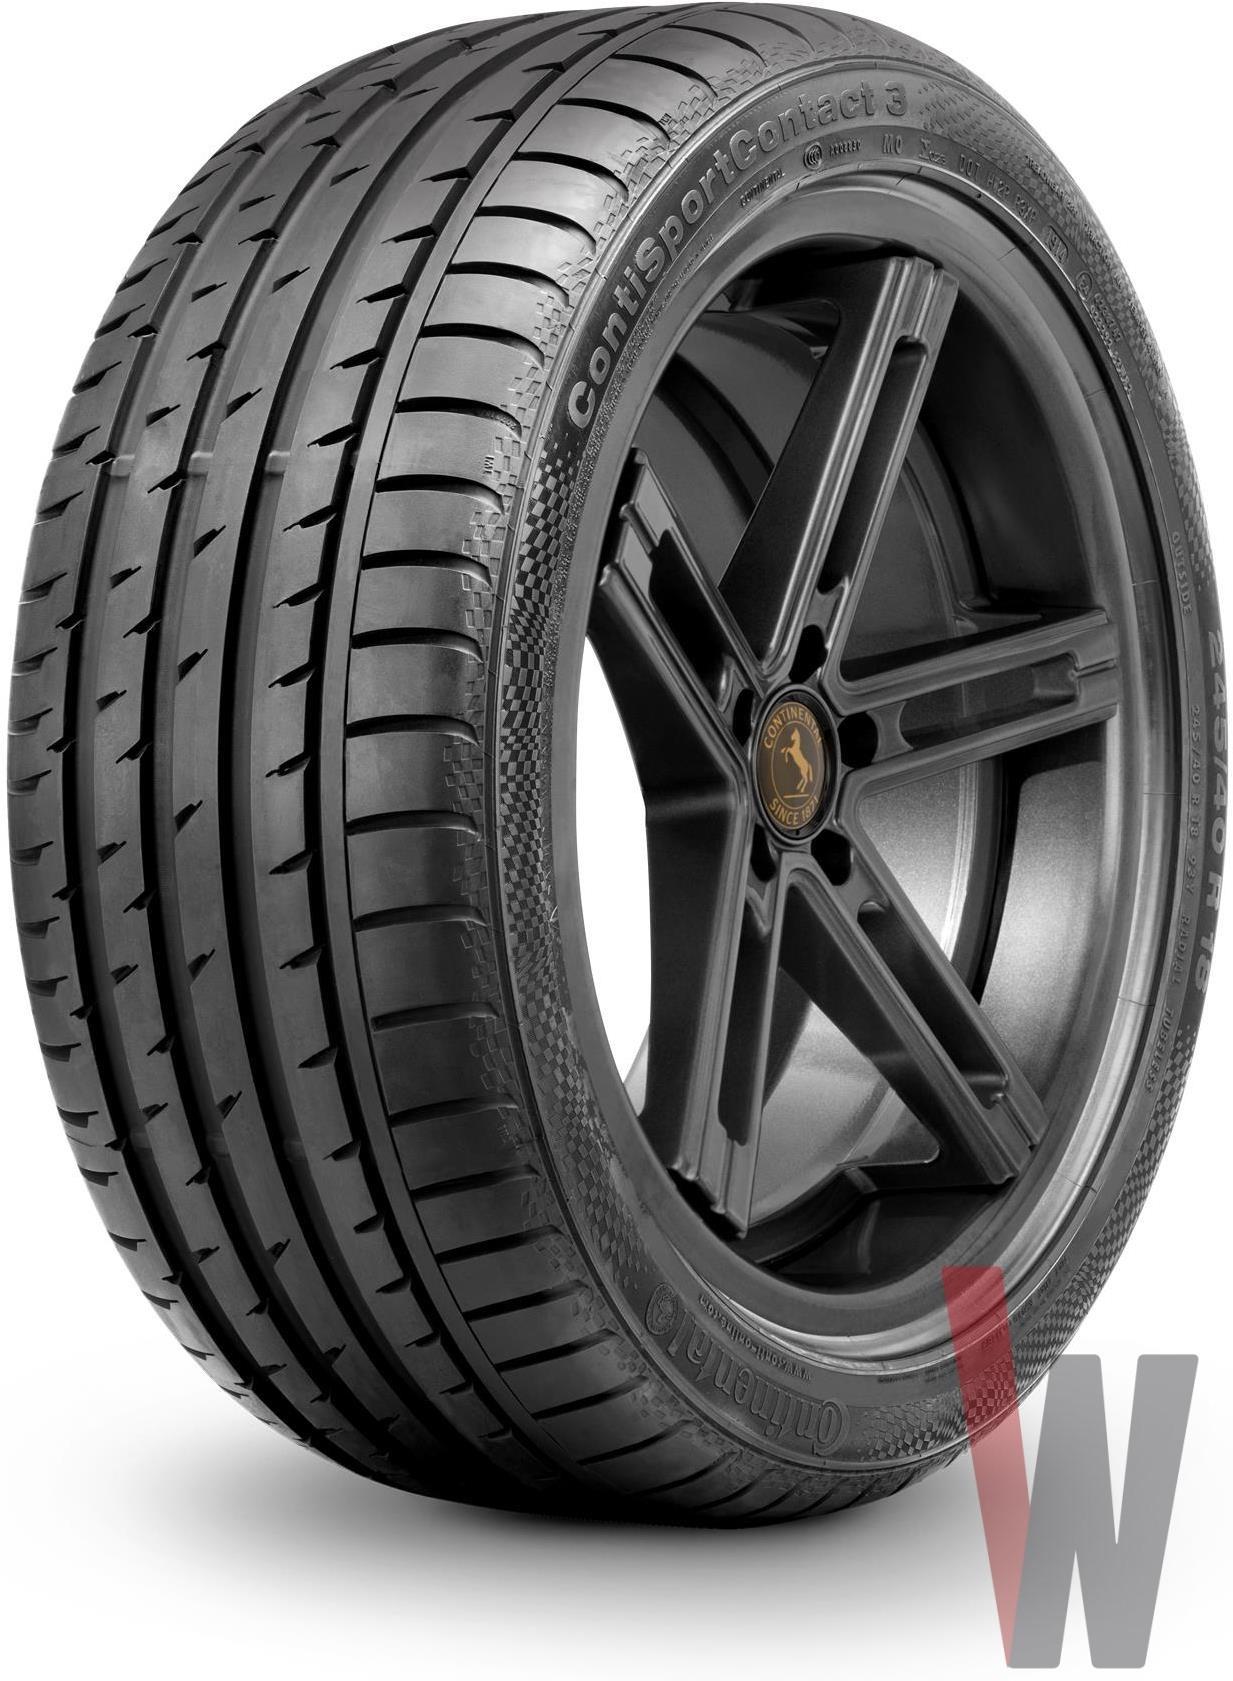 continental contisportcontact 3 run flat tires. Black Bedroom Furniture Sets. Home Design Ideas